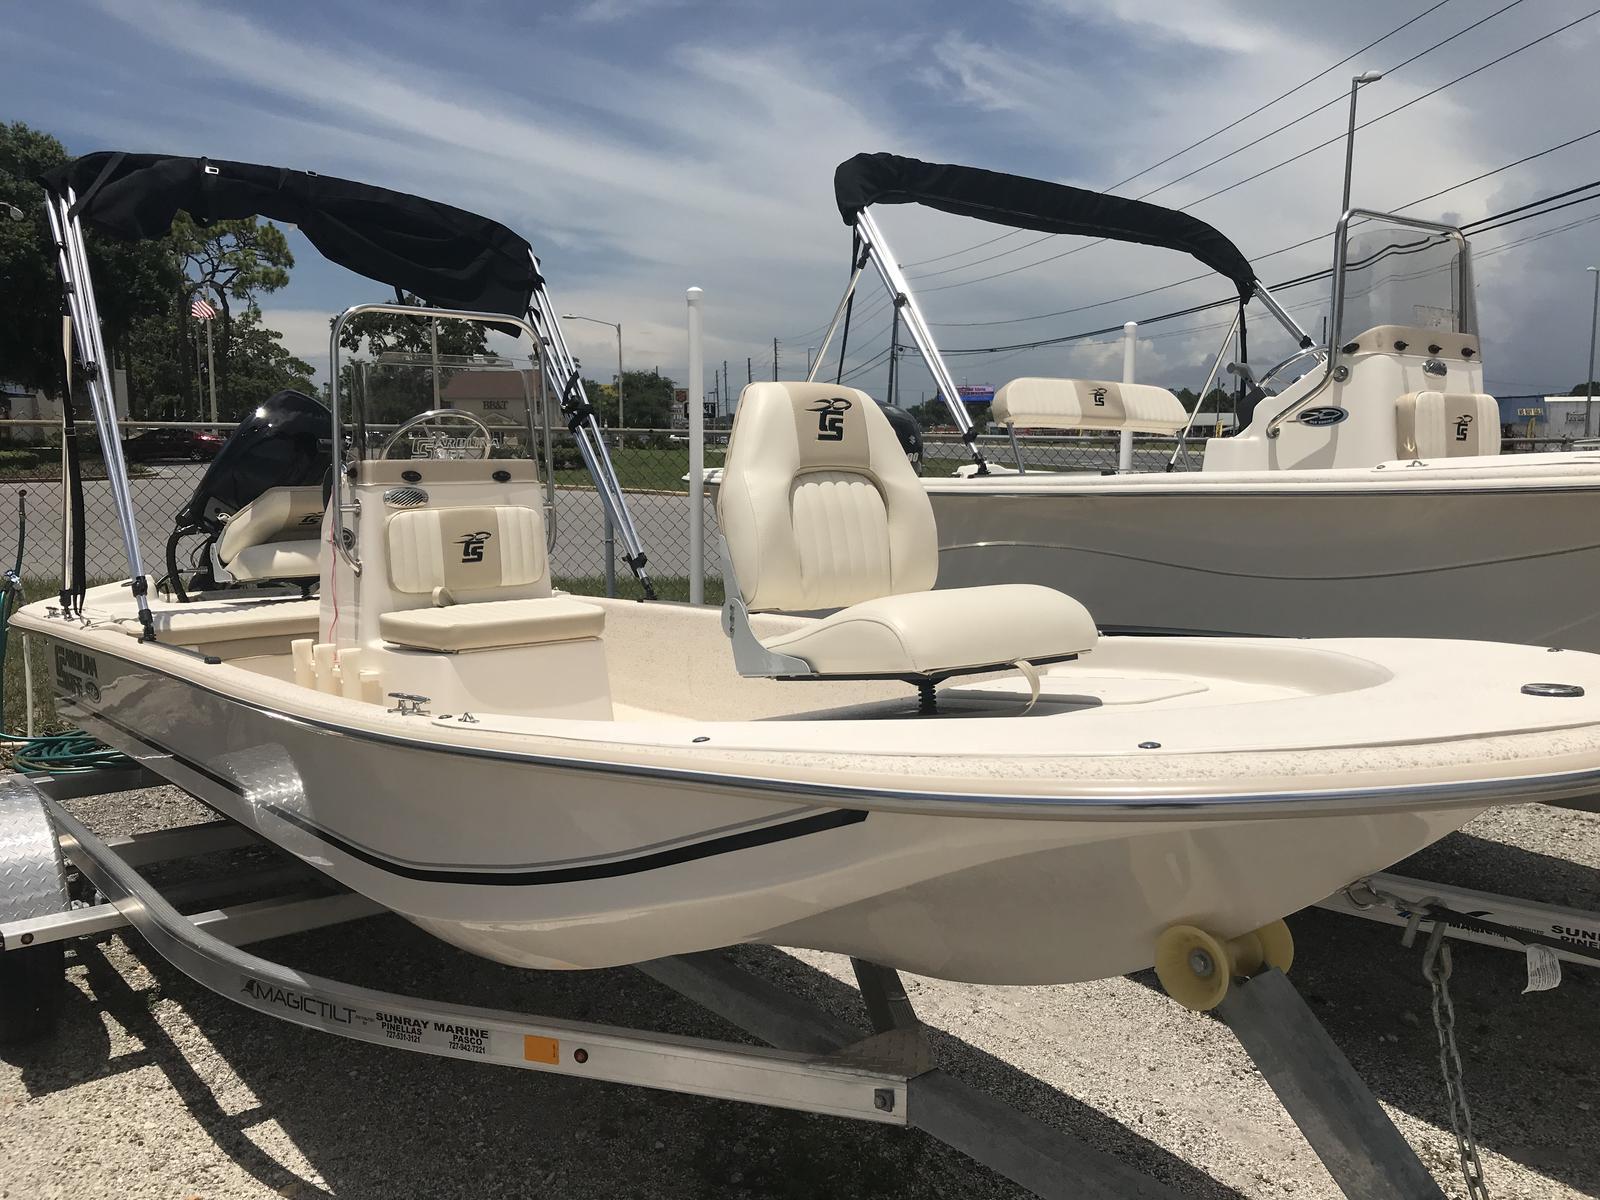 2018 Carolina Skiff 17 JV CC for sale in Holiday, FL  Sunray